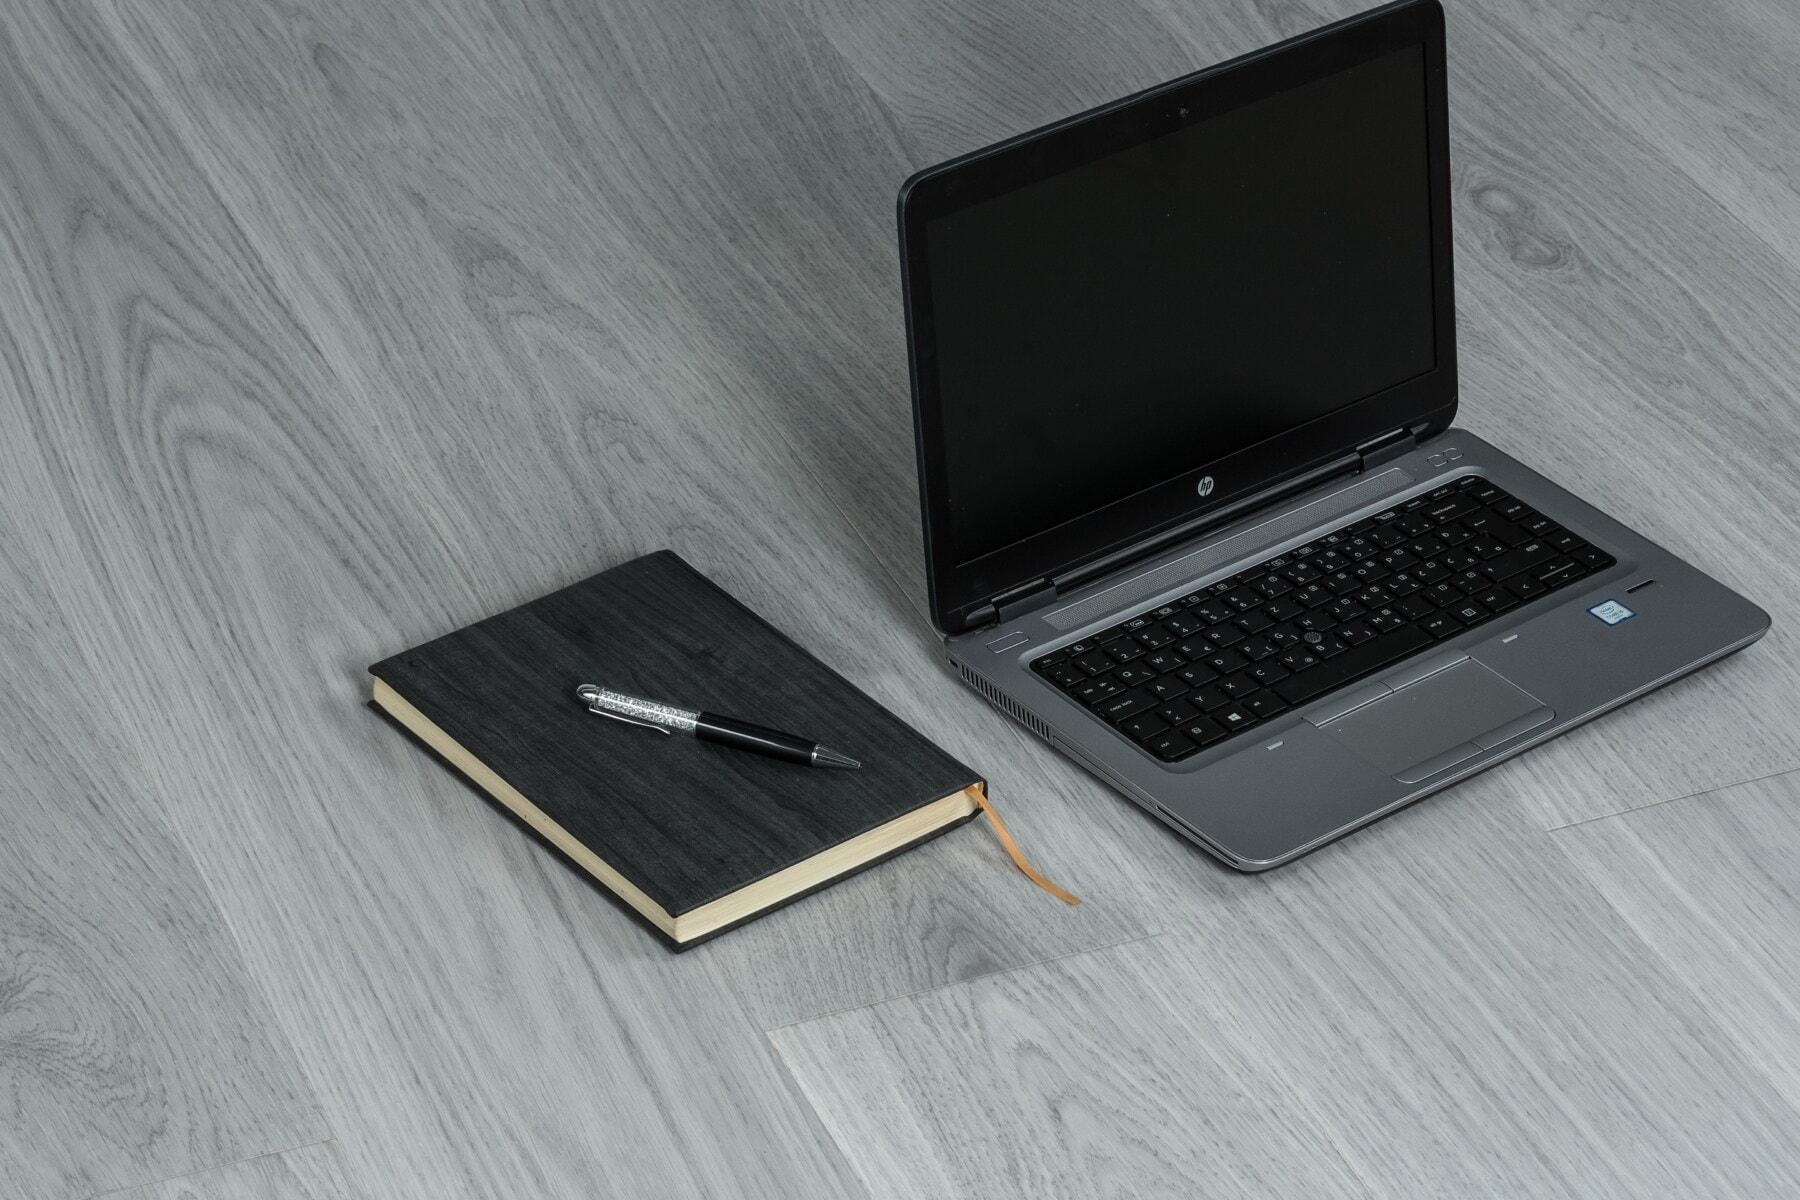 преносим компютър, черно, алуминий, сив, молив, Черно и бяло, бюро, бележник, интернет, лаптоп